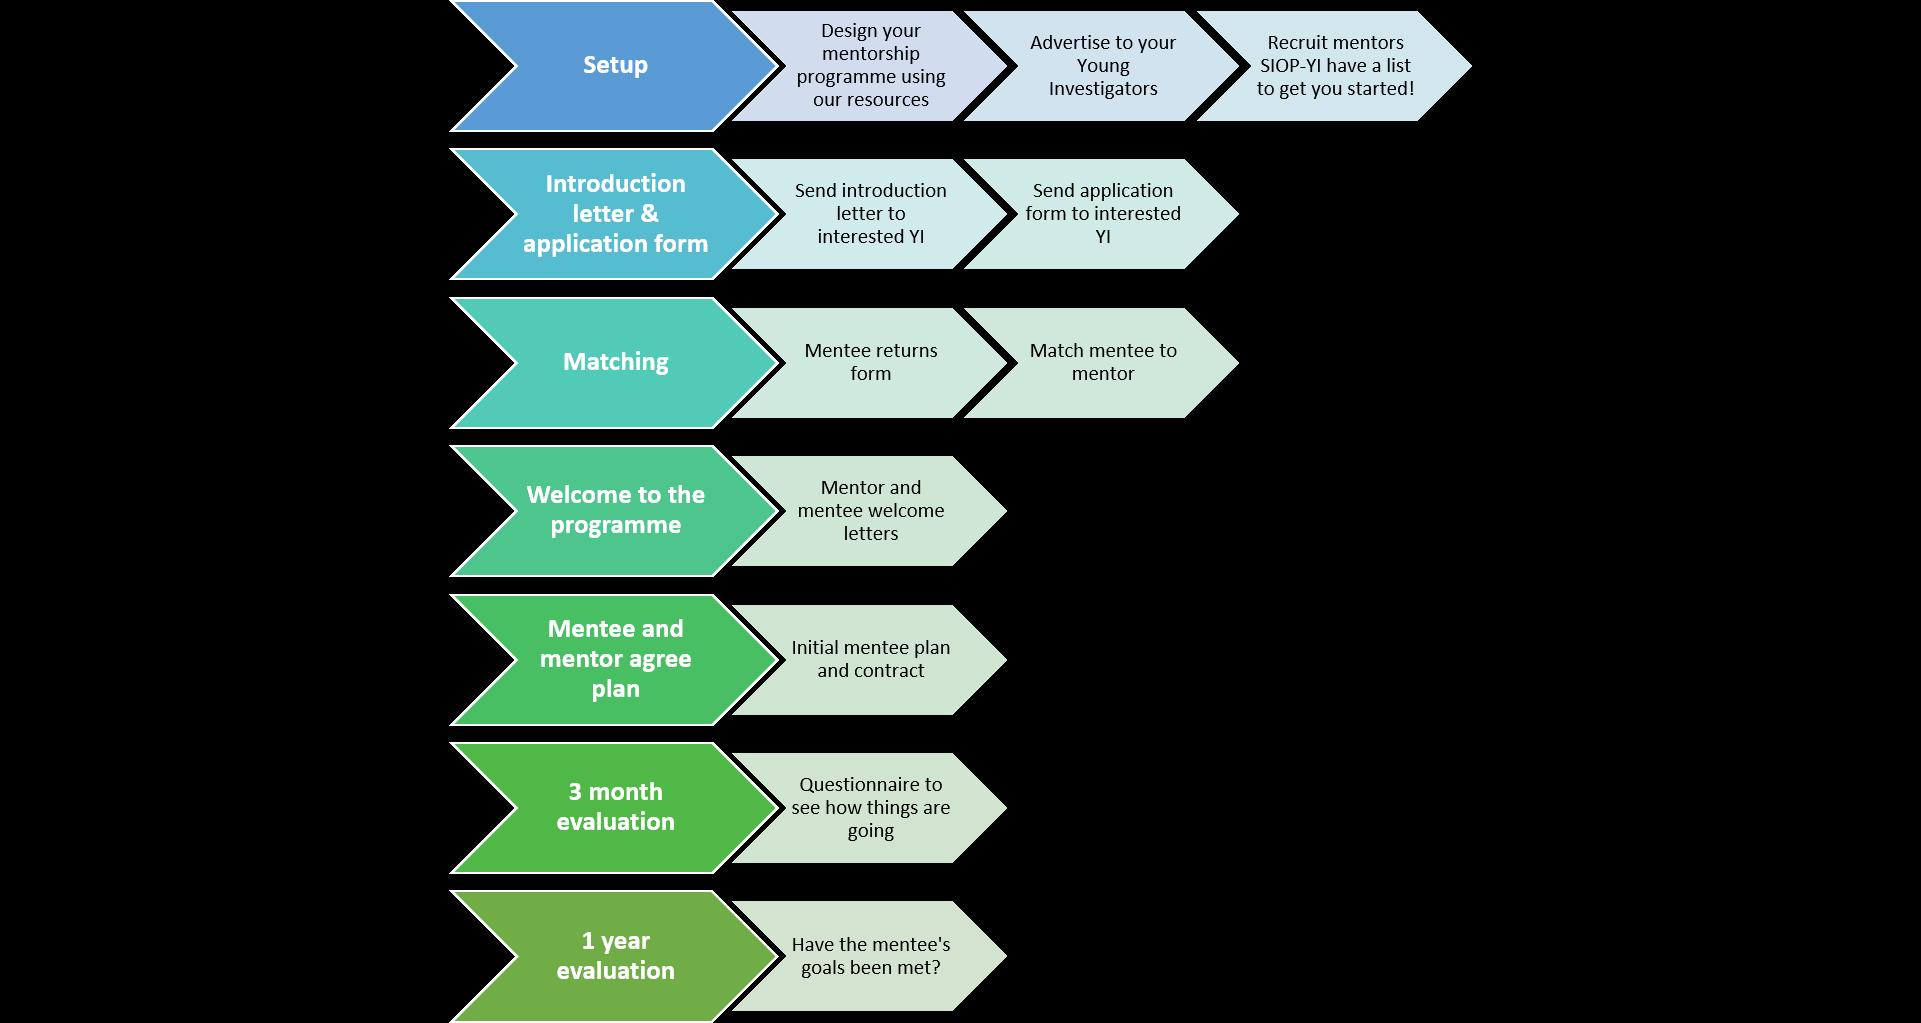 YI Mentorship Progam Set-up Process_STEP BY STEP